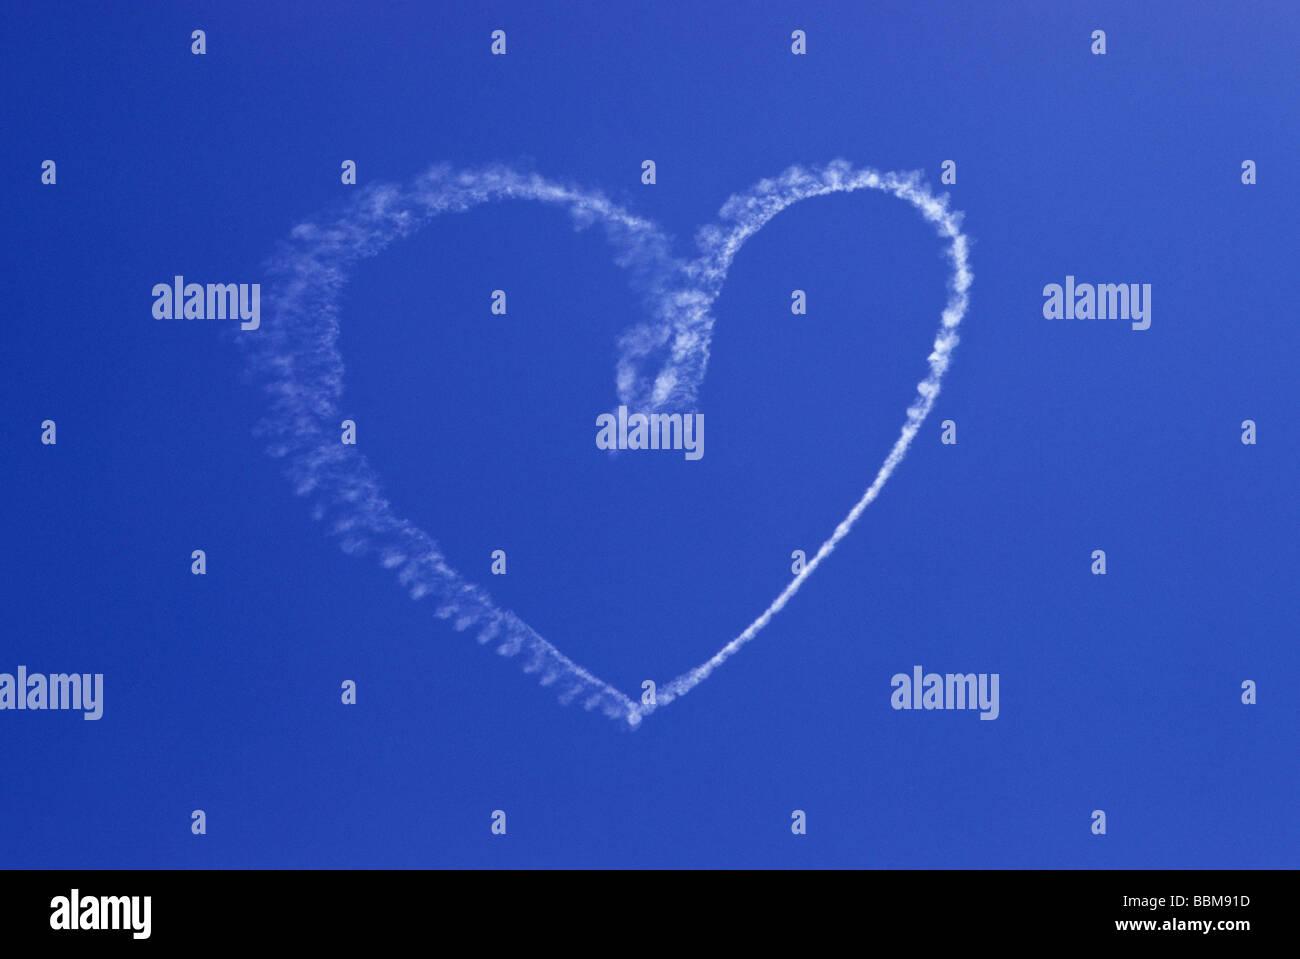 Skywrite Heart Love Message Symbol Stock Photos Skywrite Heart